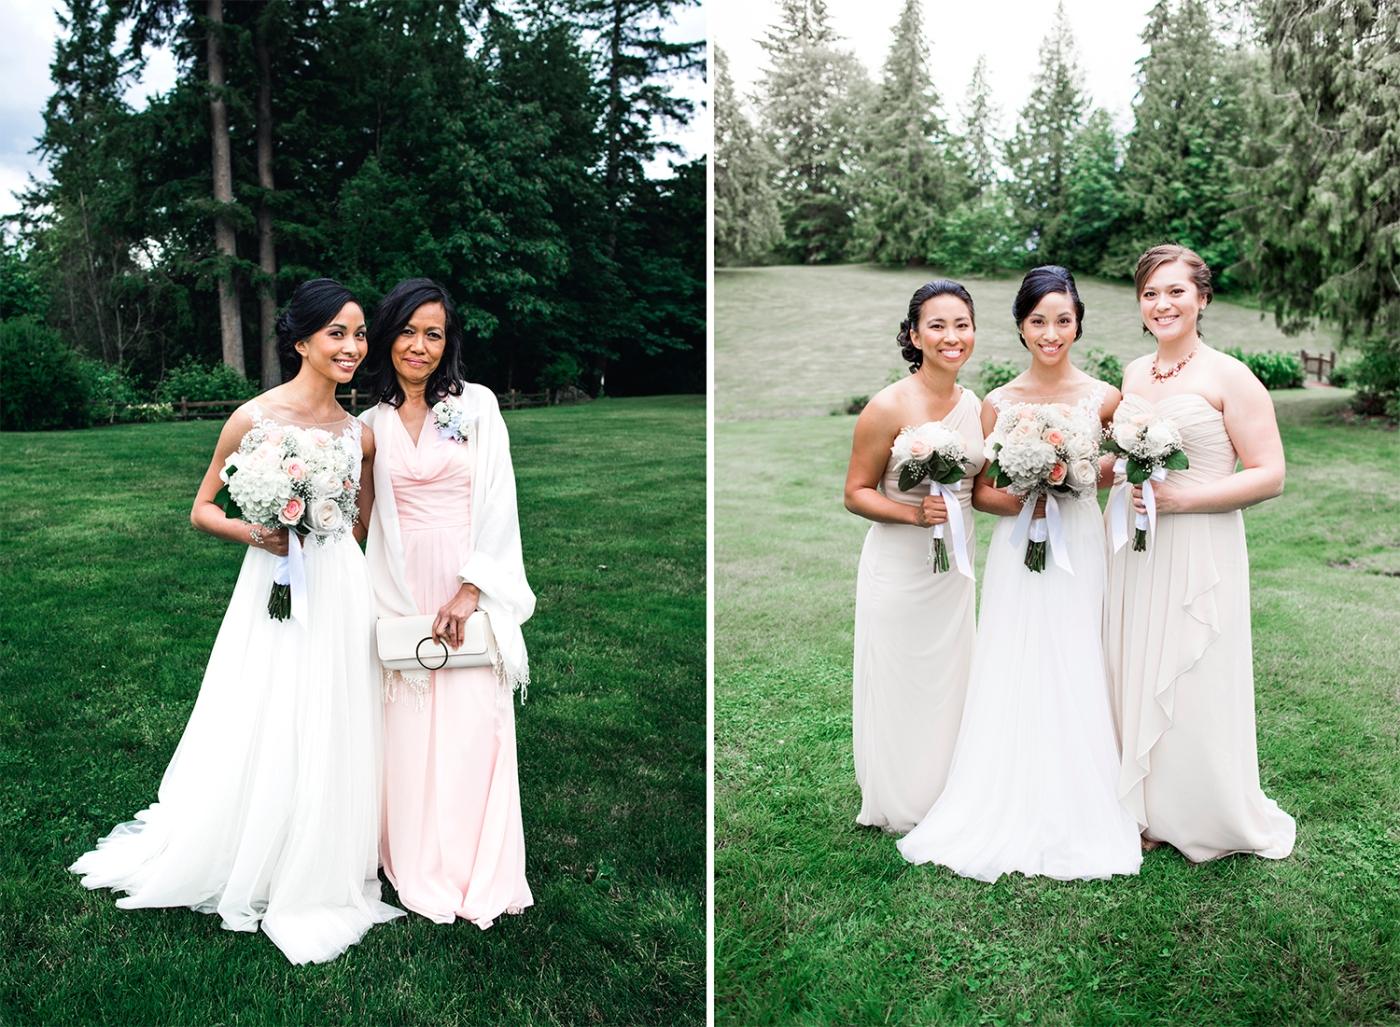 Jane_Speleers_2016_Family_Wedding_Wild_Rose_Estates_Venue_ DSC_DSC_9951 copy